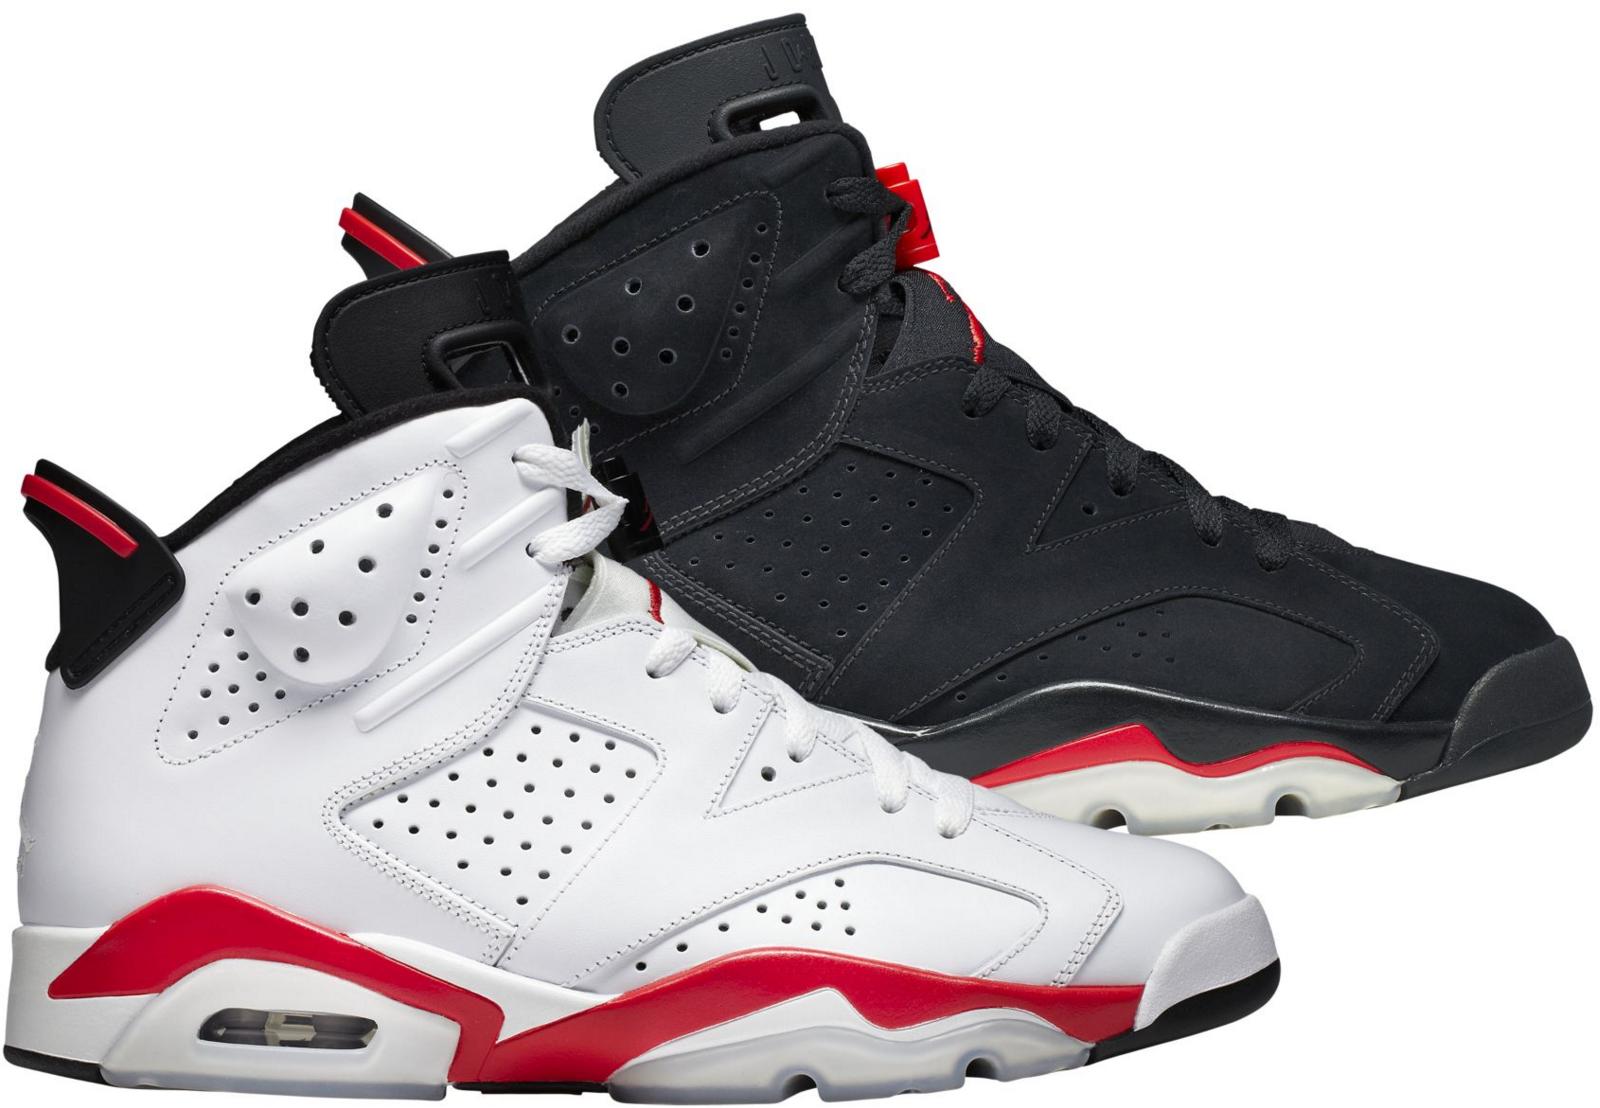 Jordan Infrared Pack 6/6